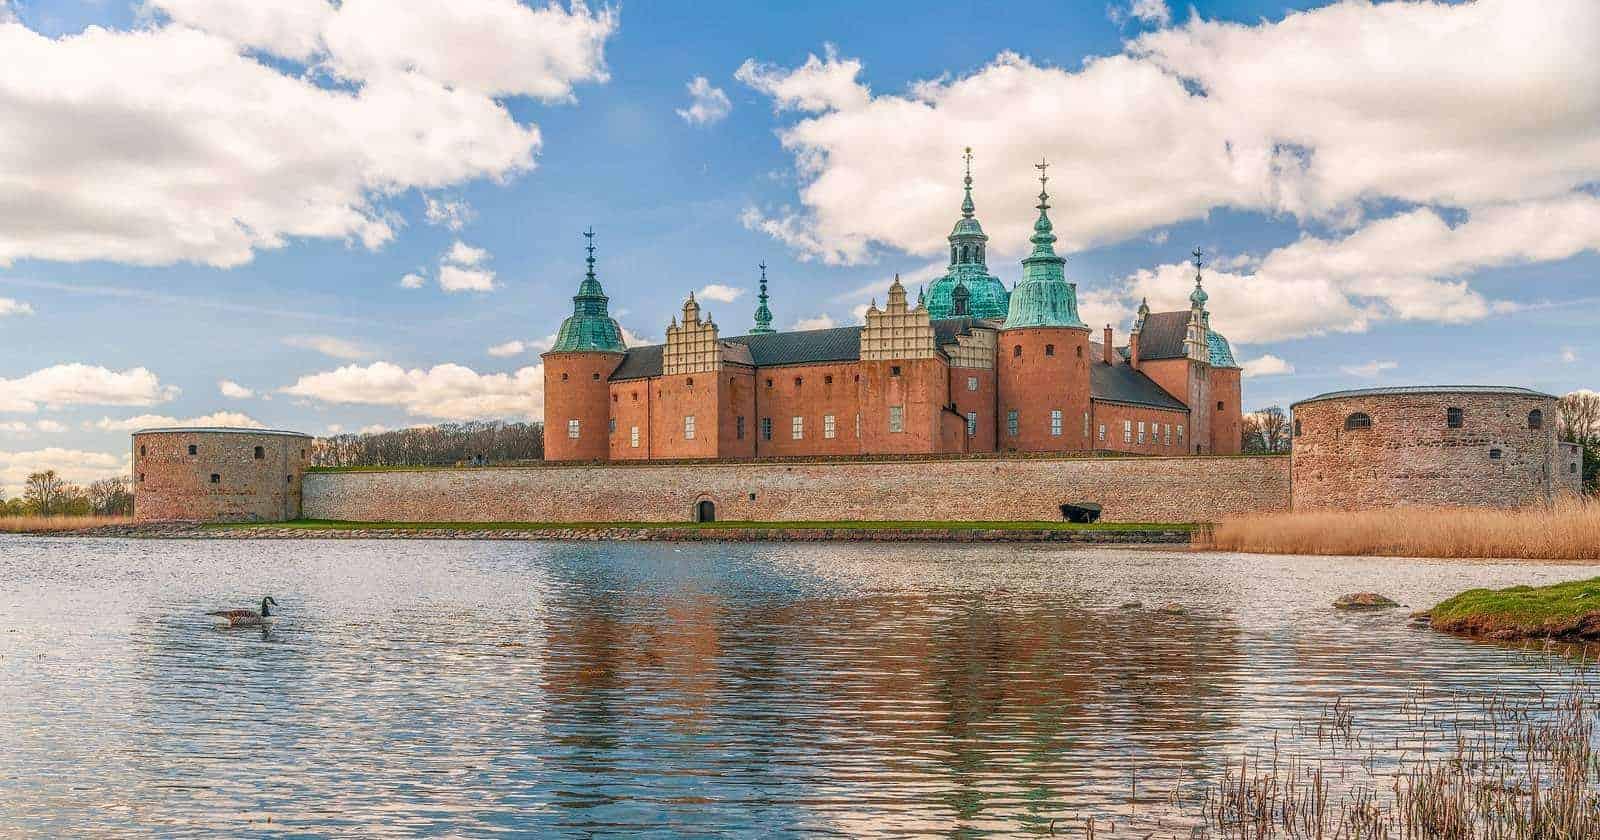 View of historic Kalmar Castle (Kalmar Slott) in the city of Kalmar. Sweden